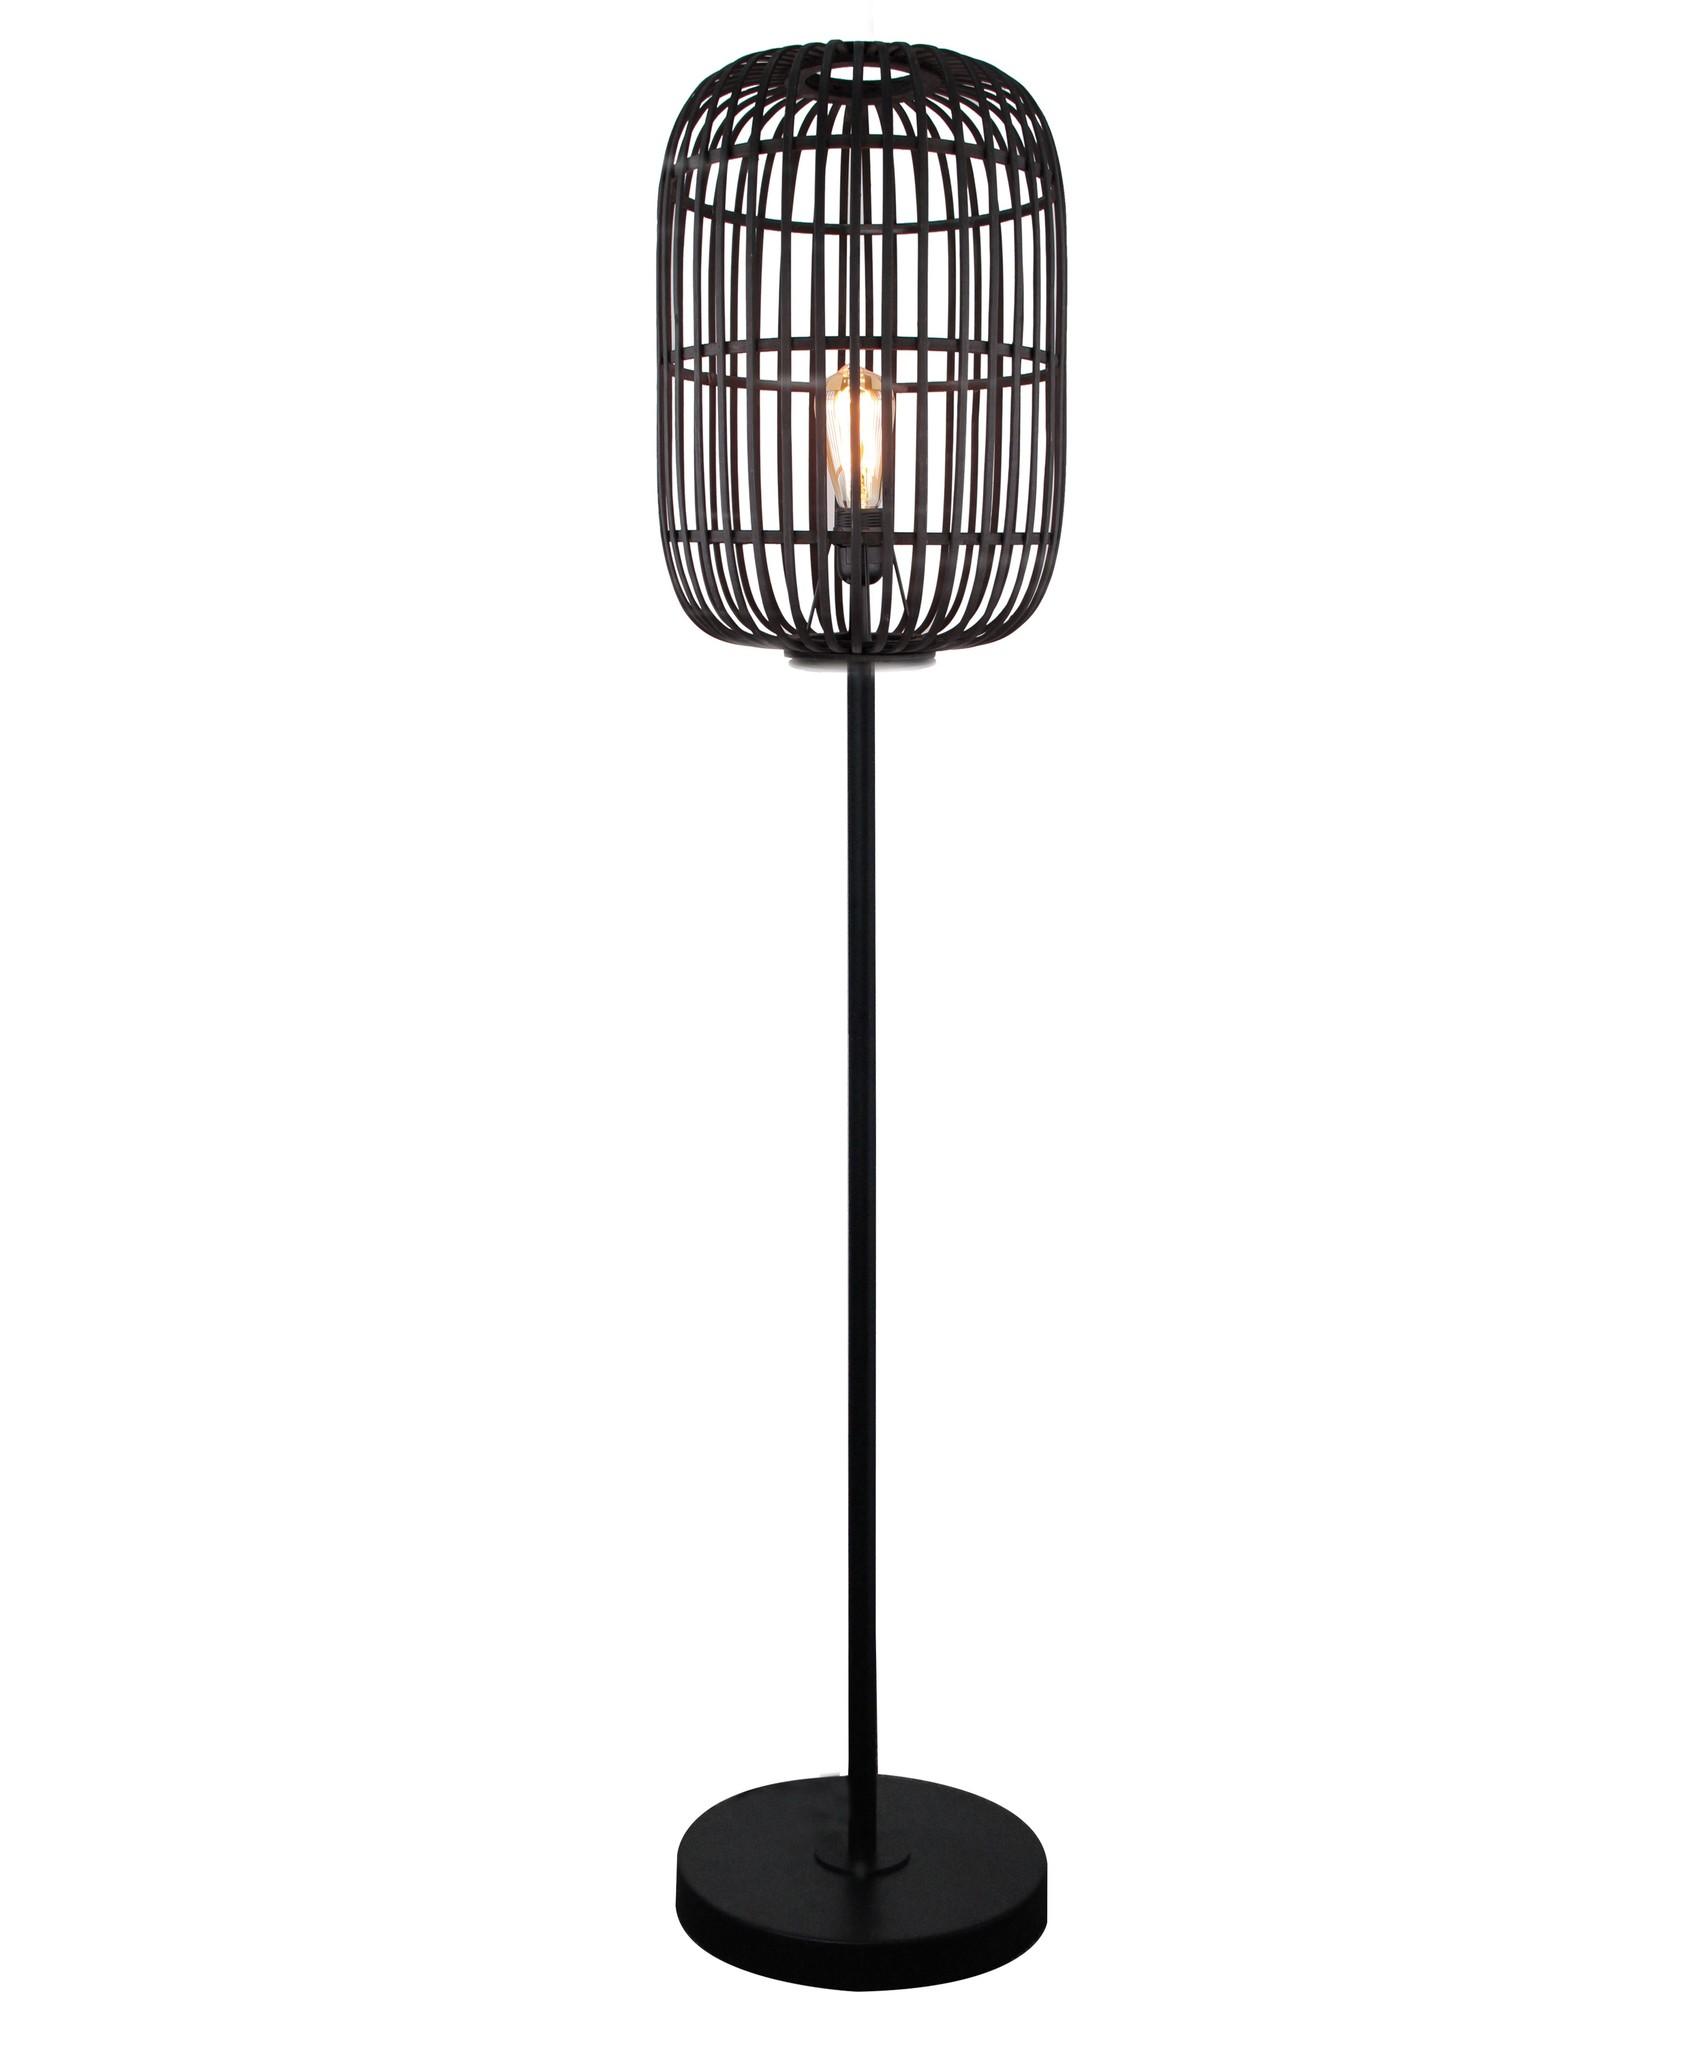 Vloerlamp Treccia Mat Zwart Rotan 175cm